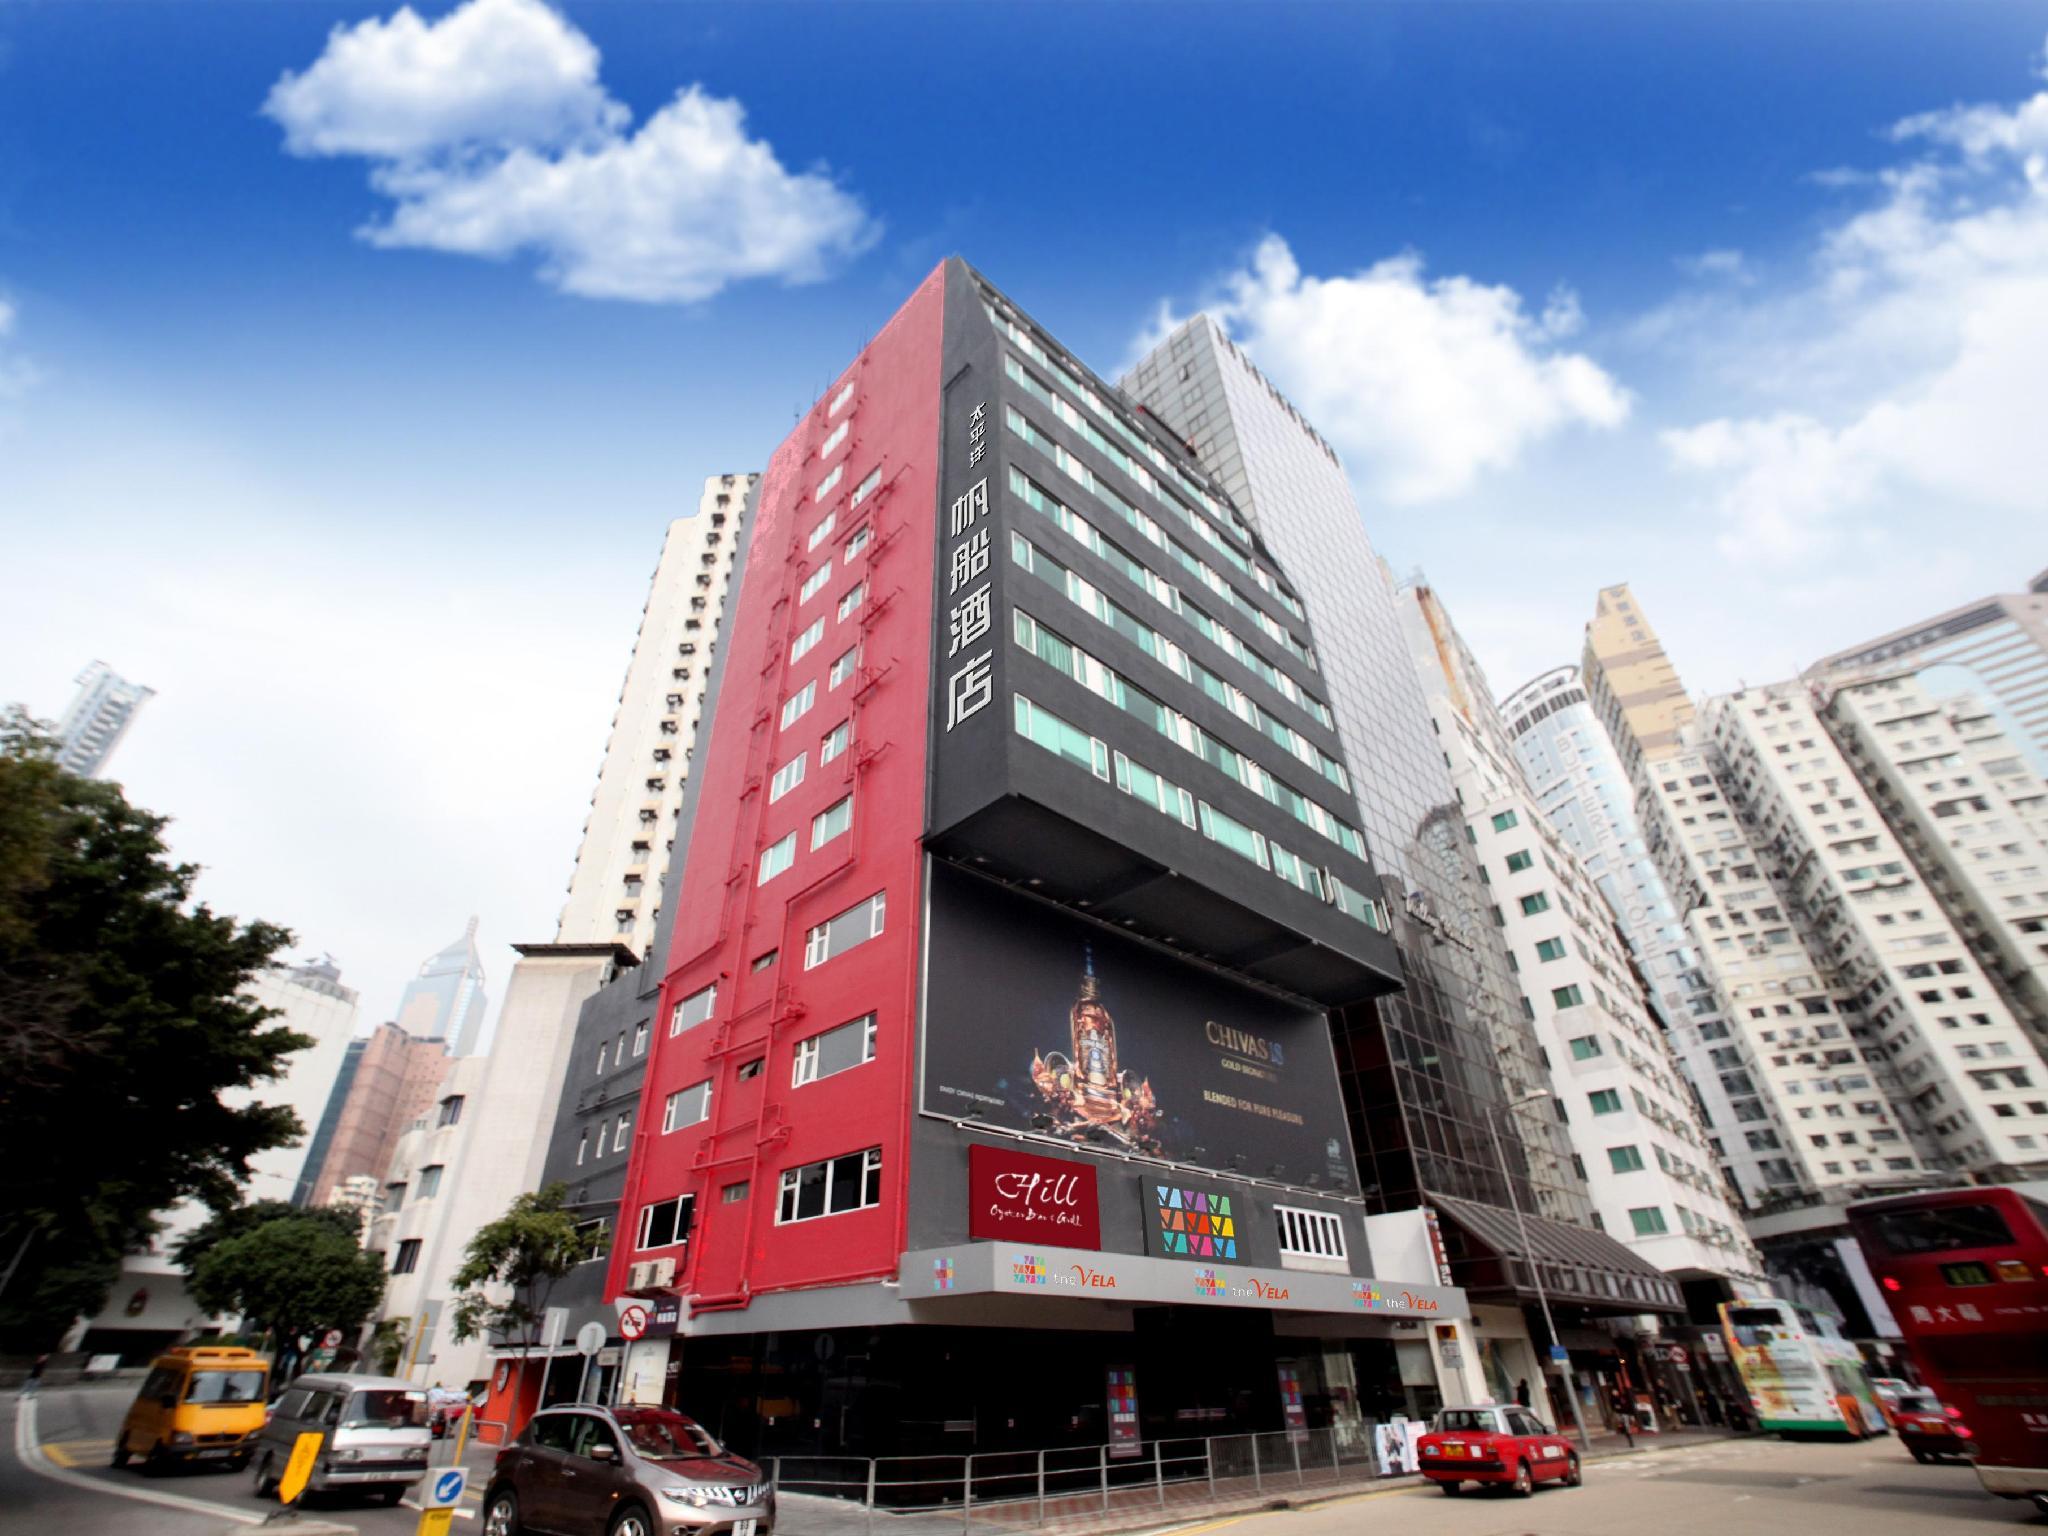 Vela Boutique Hotel